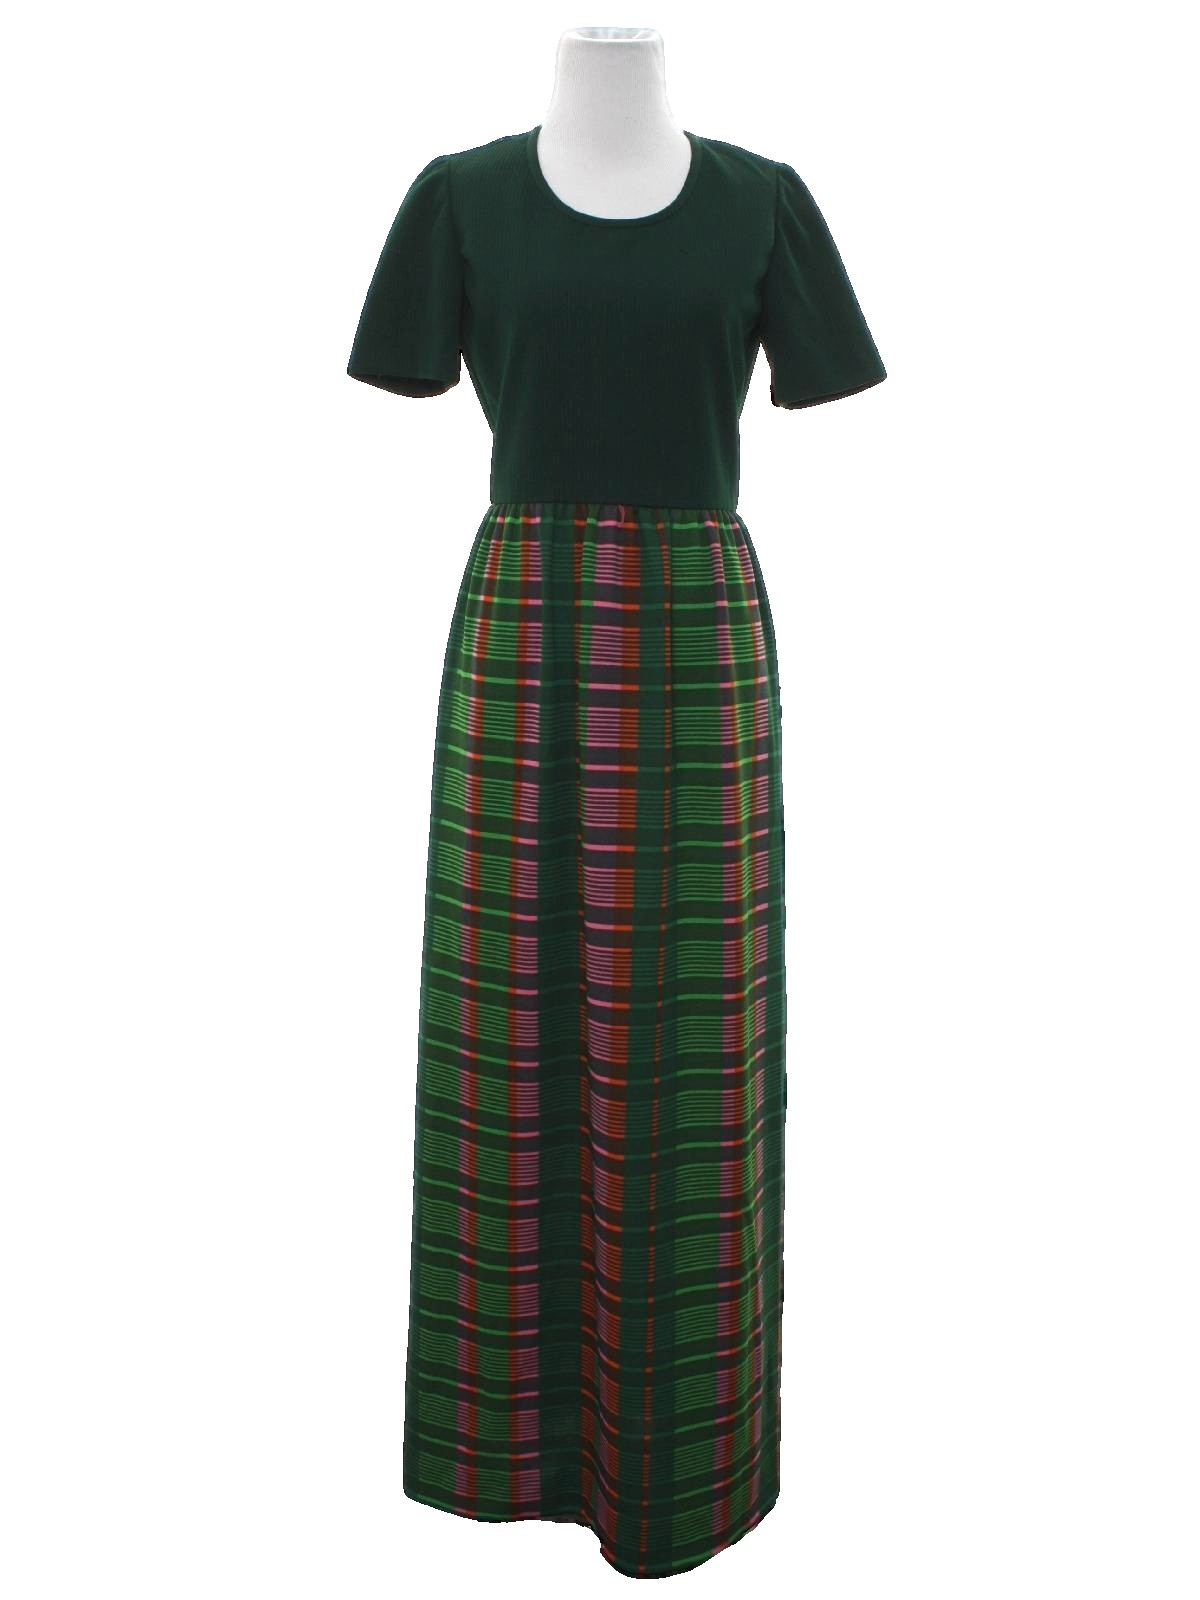 Vintage Leslie Fay maxi knit dress